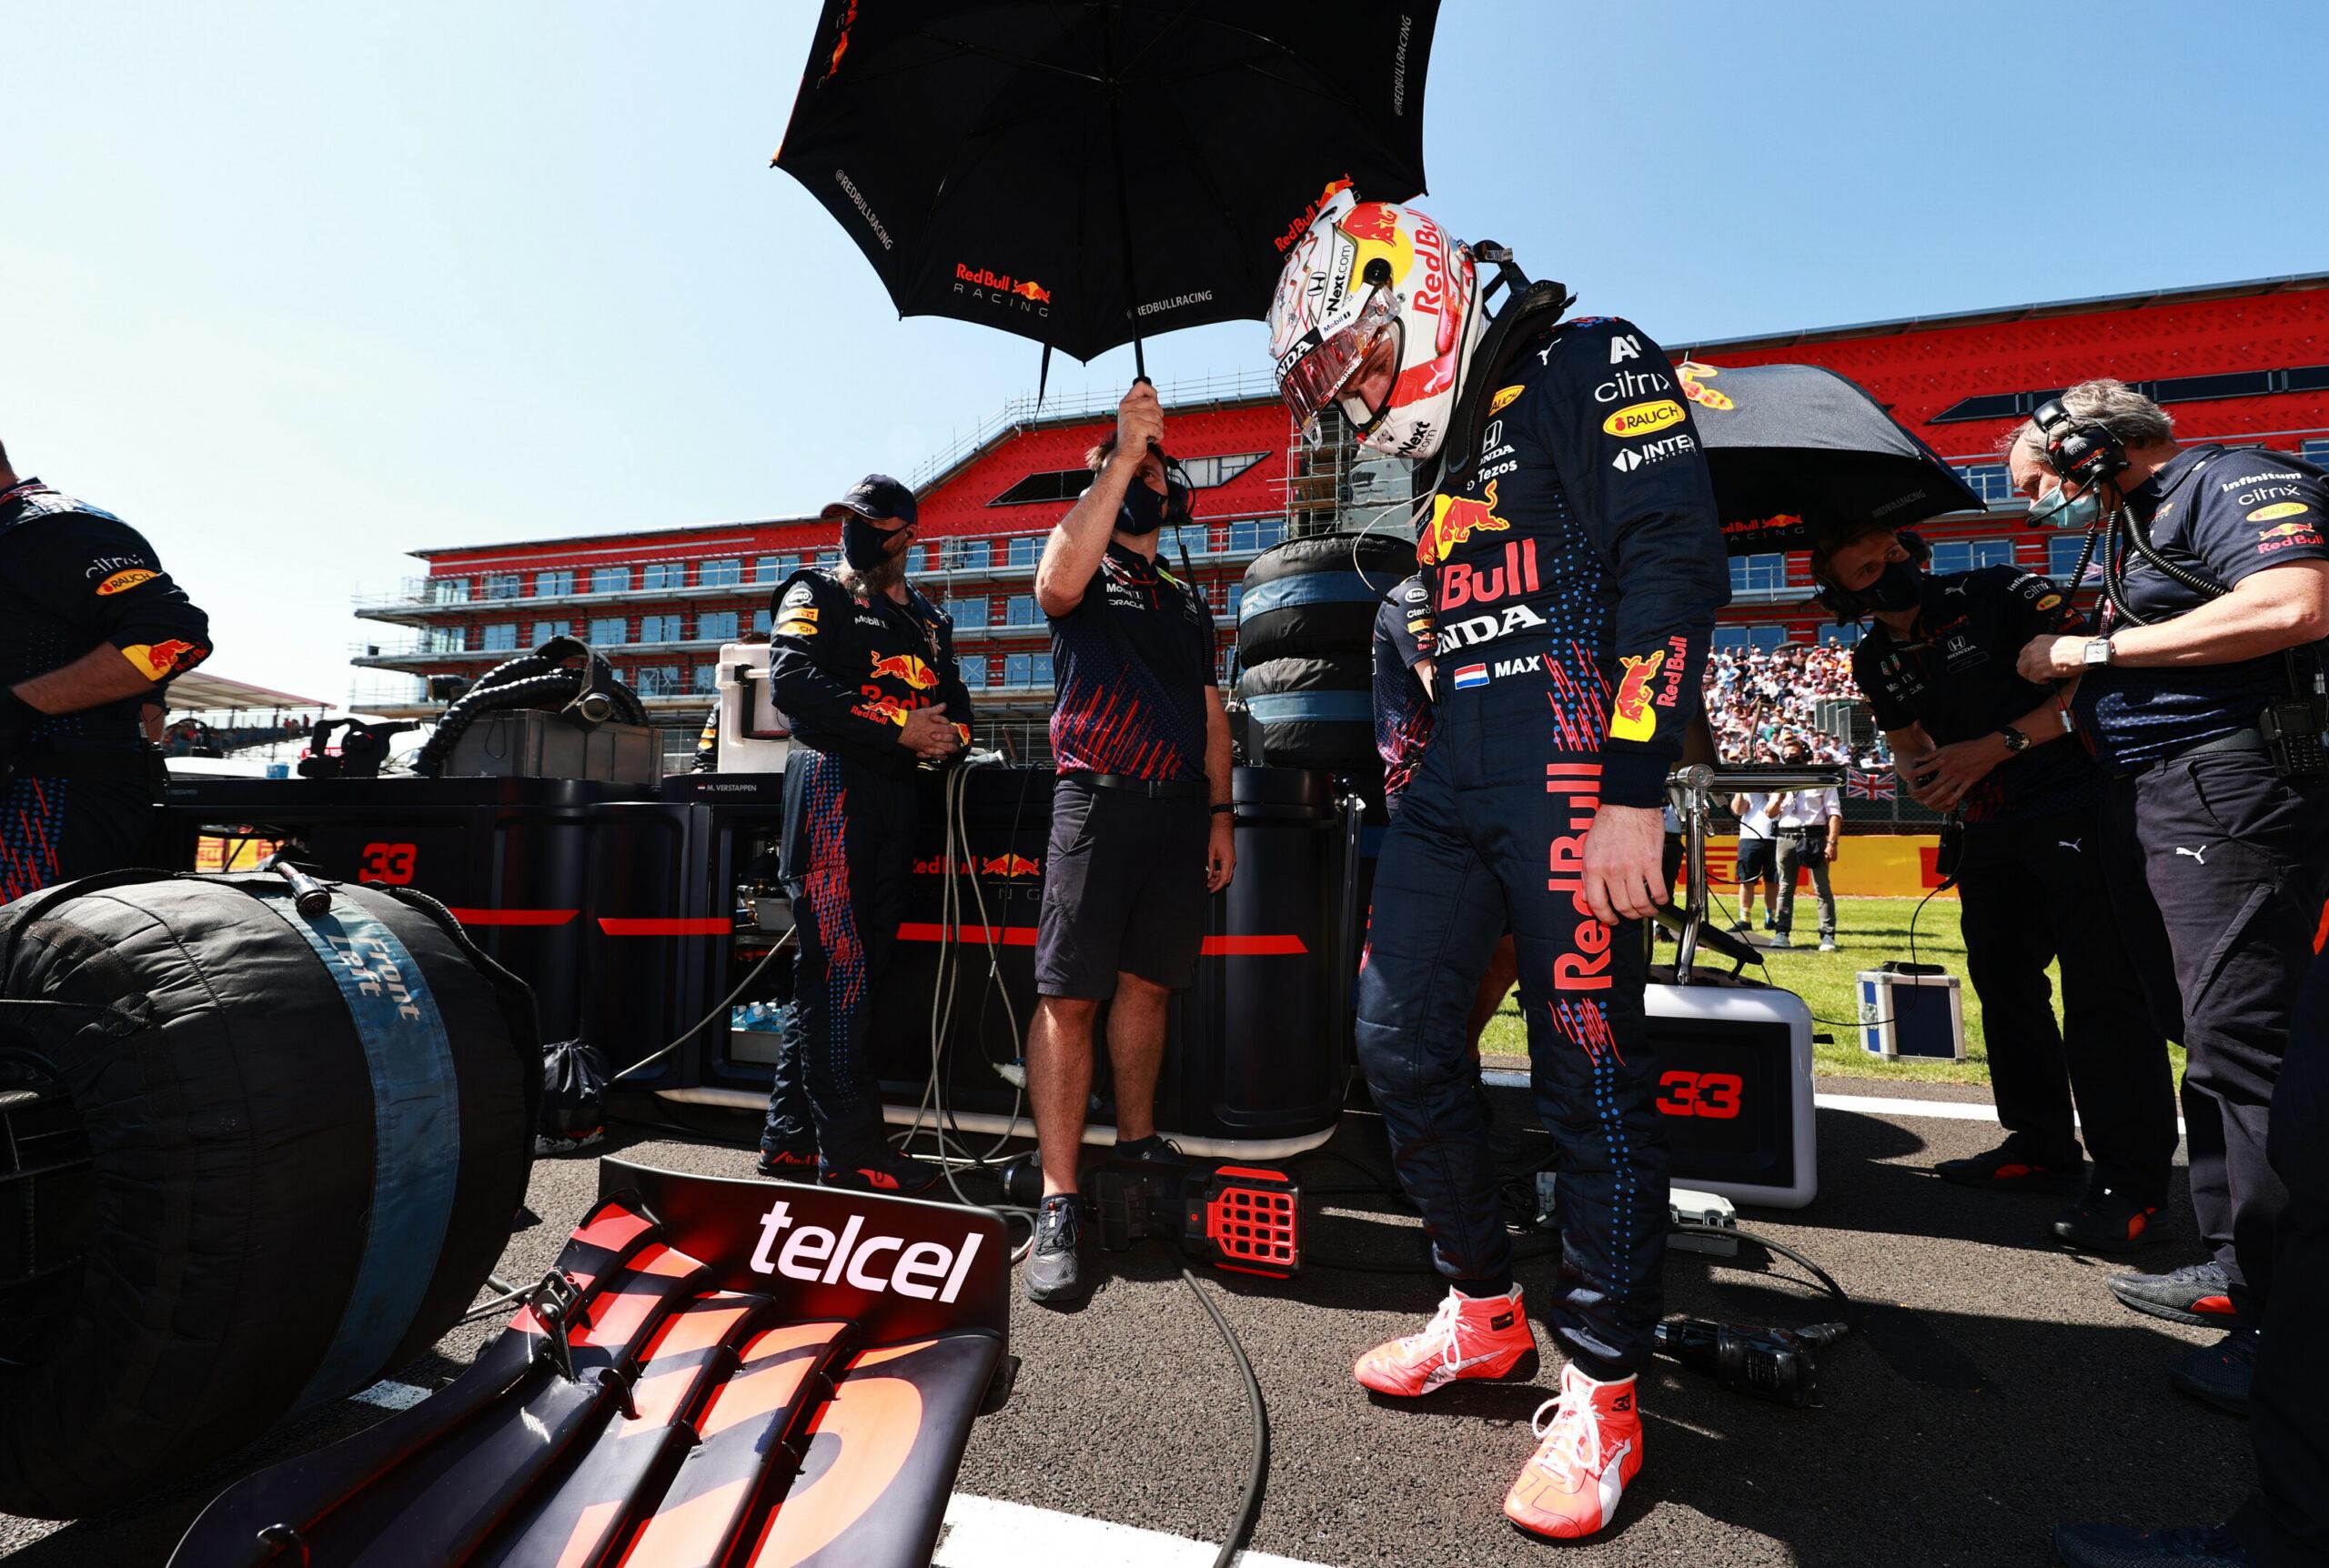 F1 - L'abandon de Verstappen ne fait que motiver davantage Red Bull